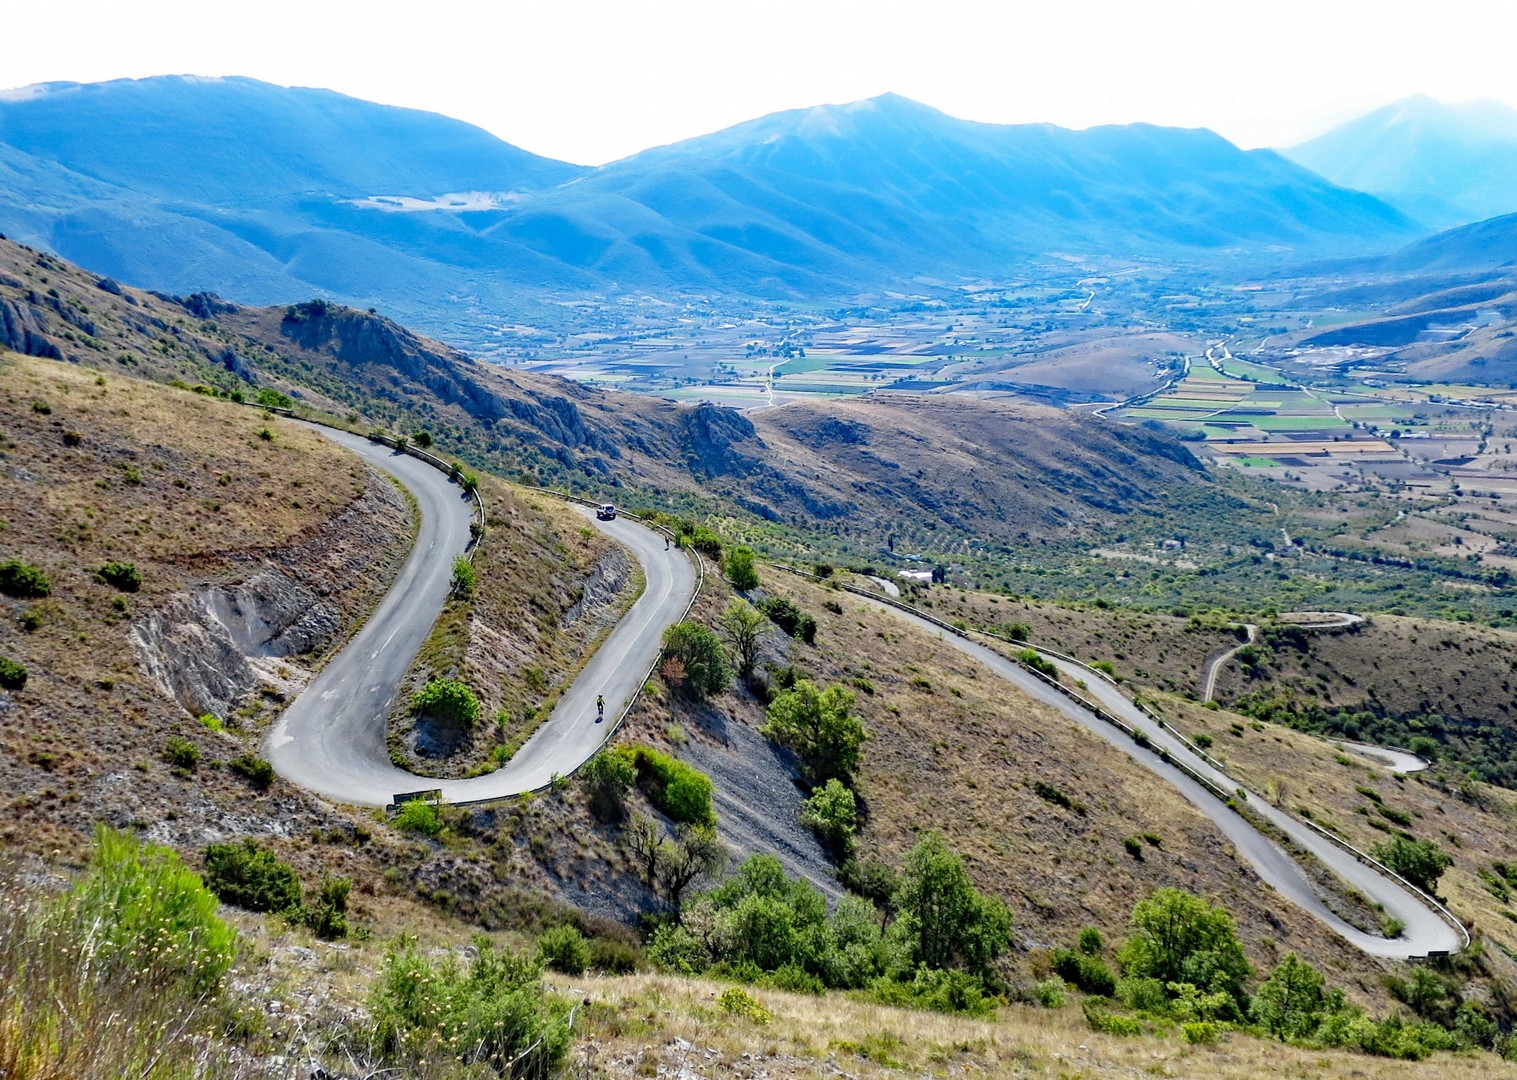 montepulcino-dabruzzo-guided-road-cycling-holiday-italy-abruzzo-appennini-dabruzzo.jpg - Italy - Abruzzo - Appennini d'Abruzzo - Guided Road Cycling Holiday - Road Cycling